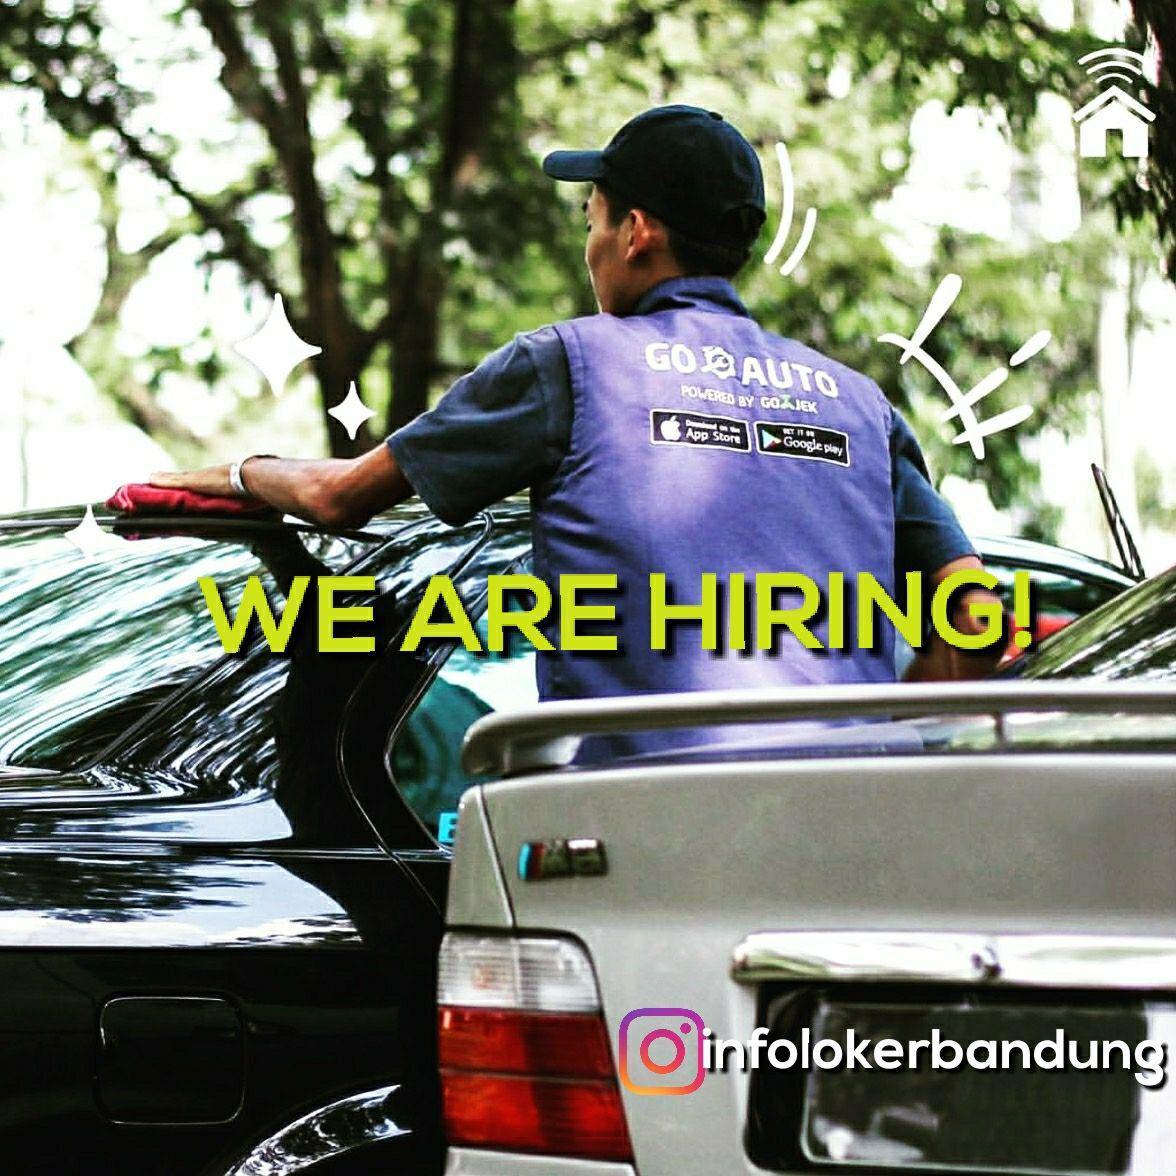 Lowongan Kerja Auto Detailing ( Mitra Gojek ) Bandung April 2018